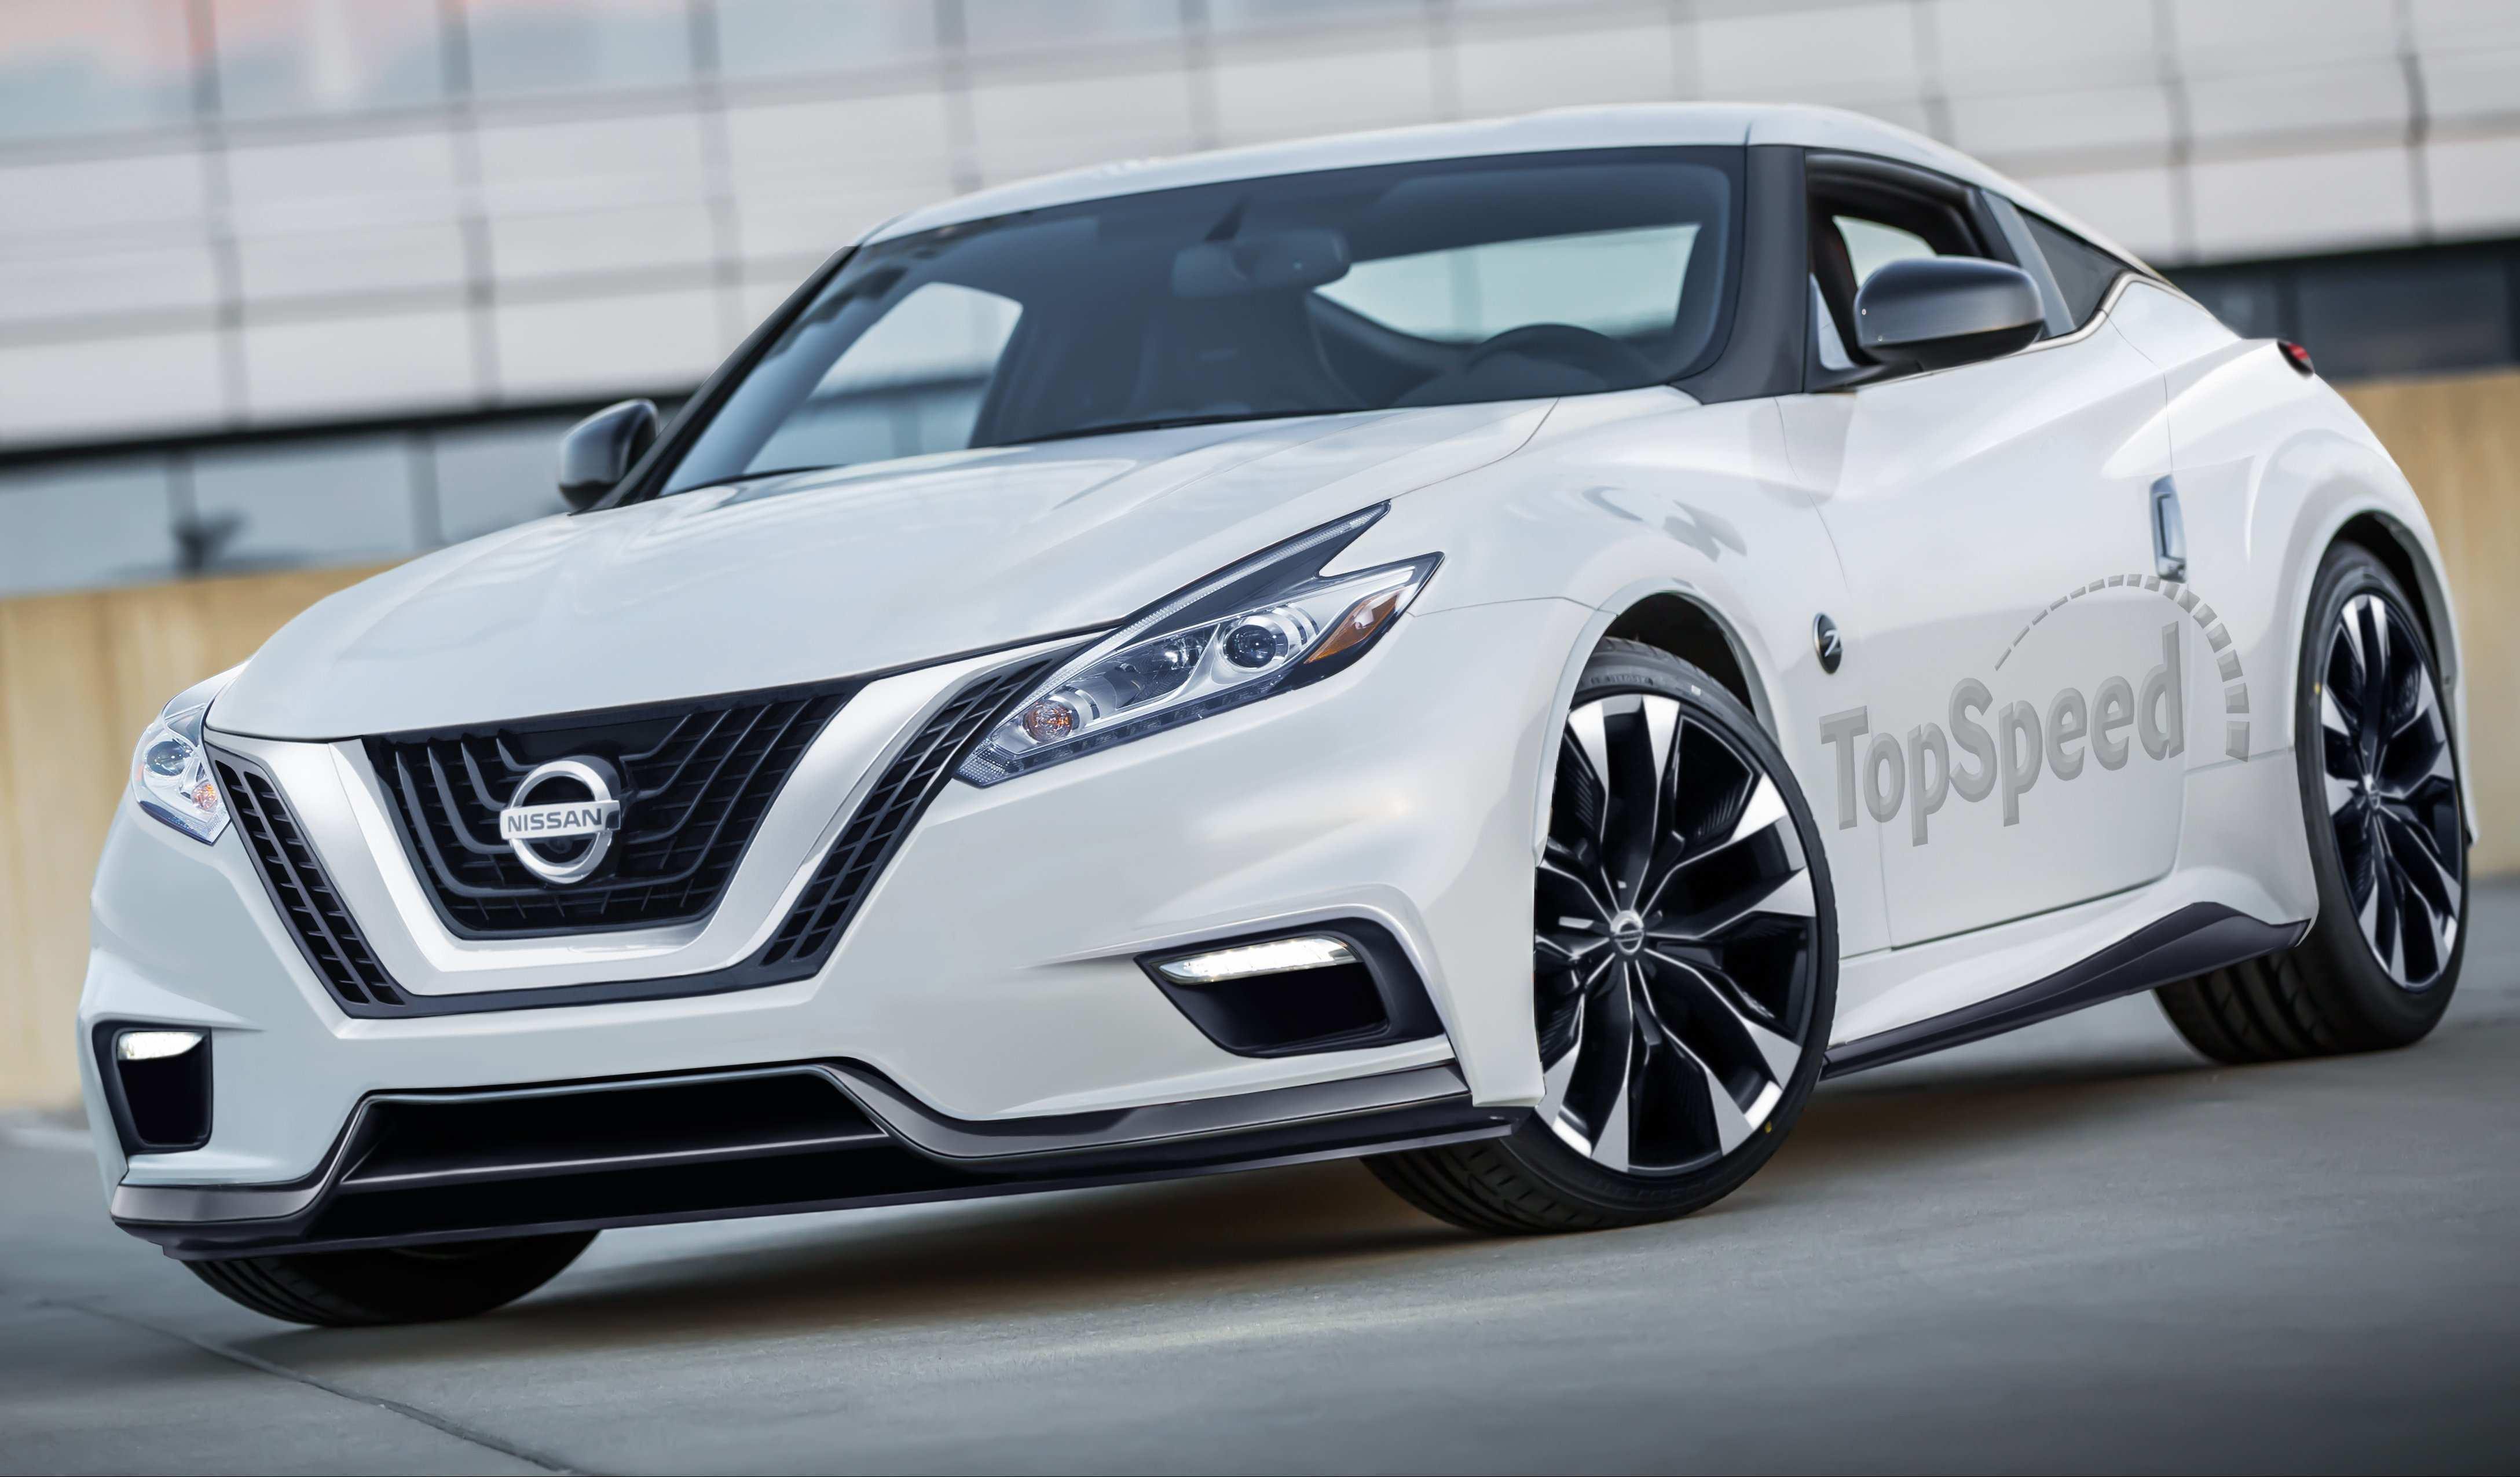 34 New 2019 Nissan Z News Interior for 2019 Nissan Z News